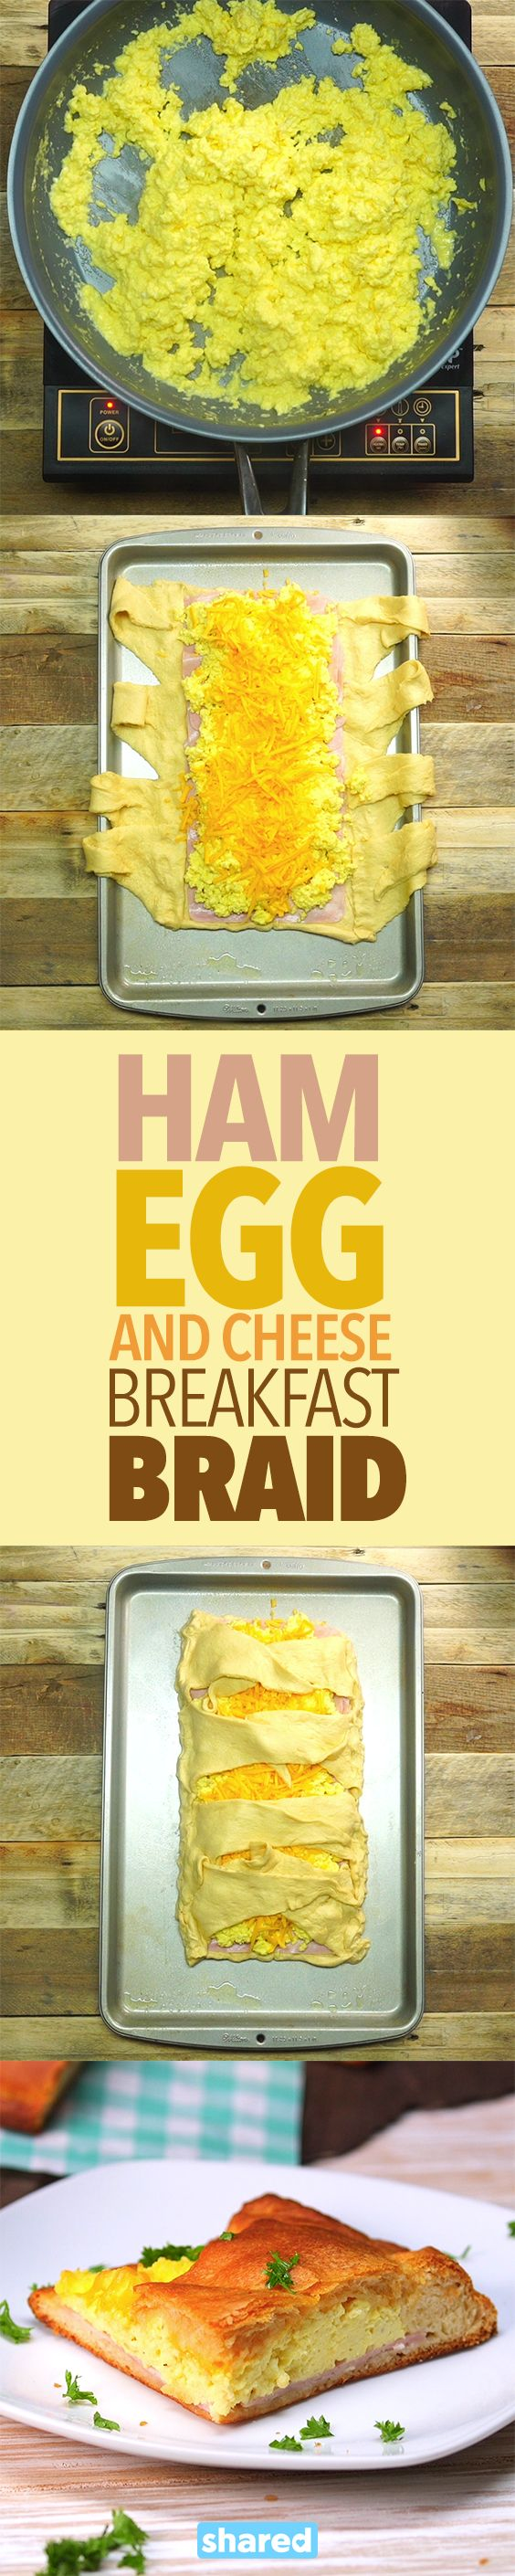 Ham, Egg and Cheese Breakfast Braid